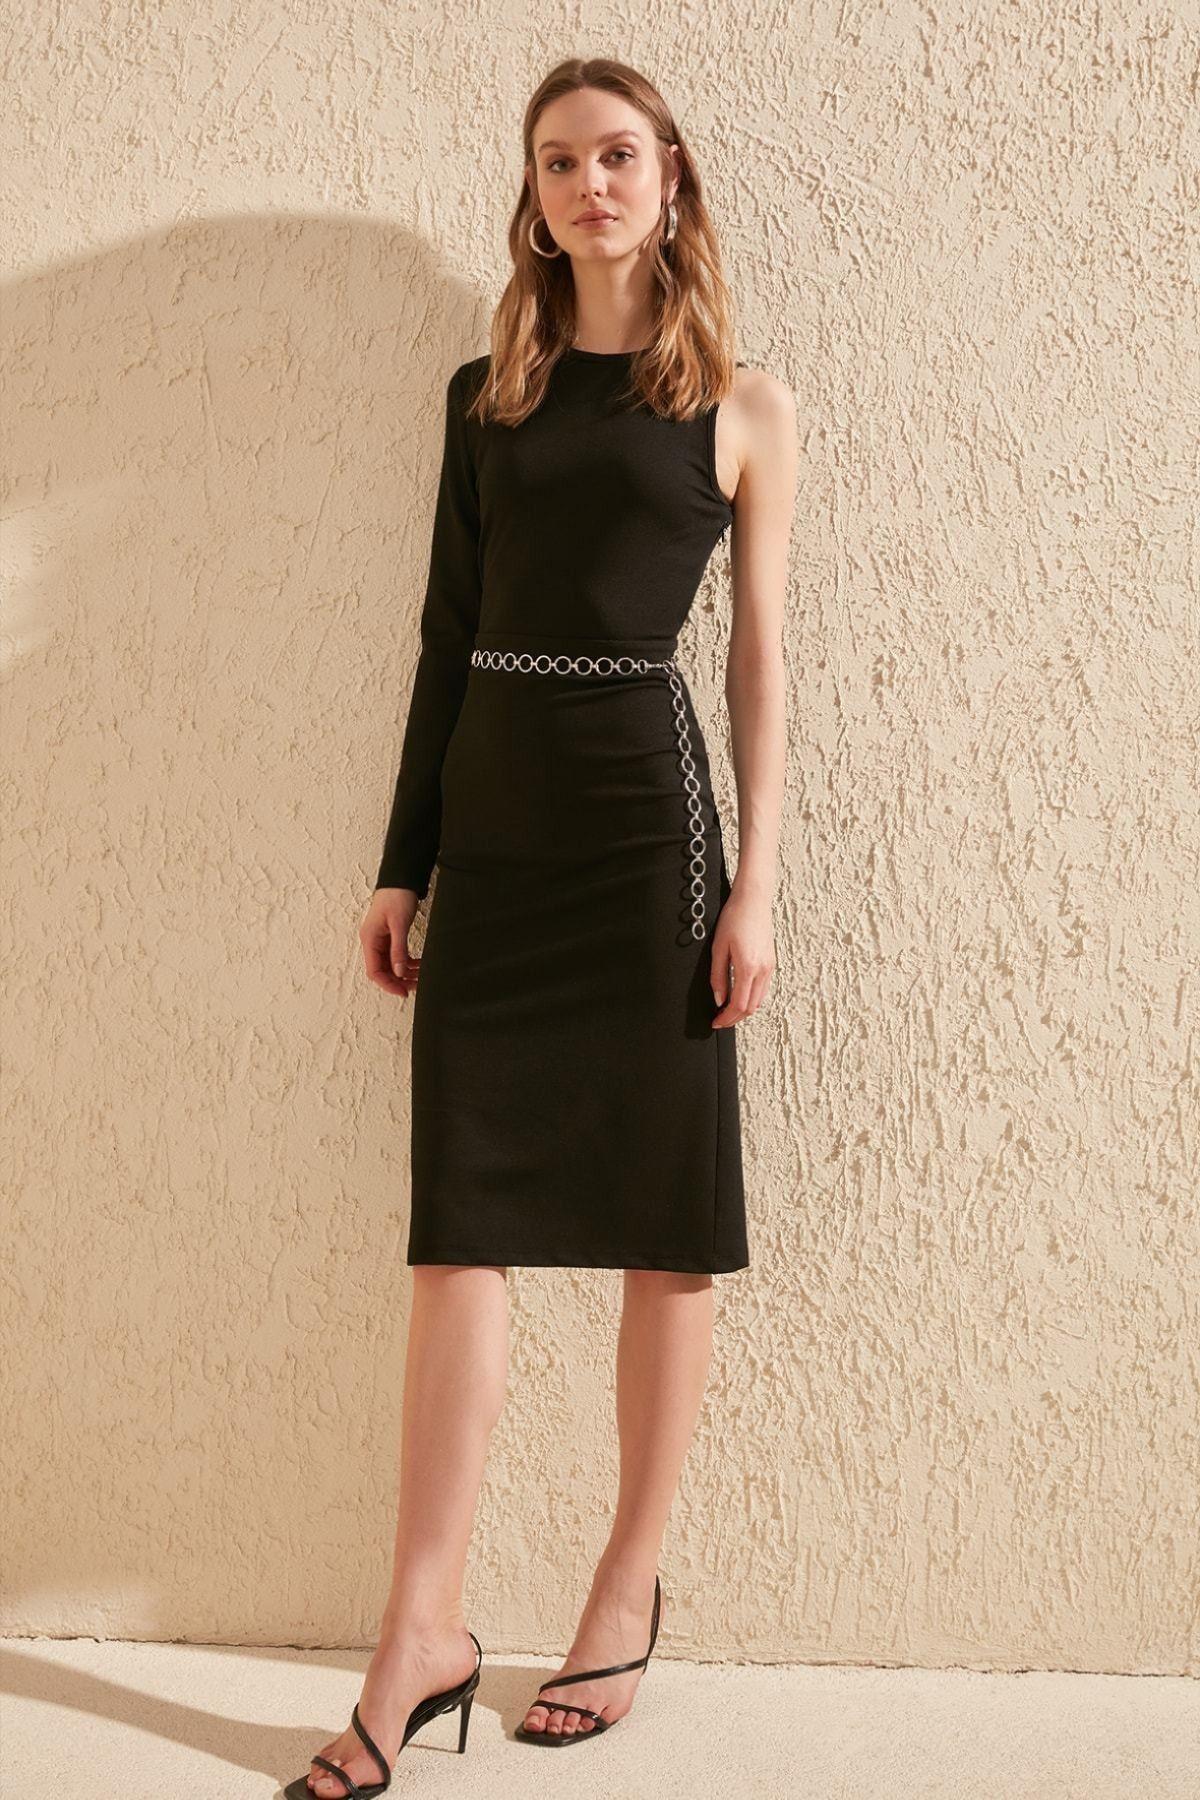 Best of Instagram Fashion: Black One Shoulder Midi Dress